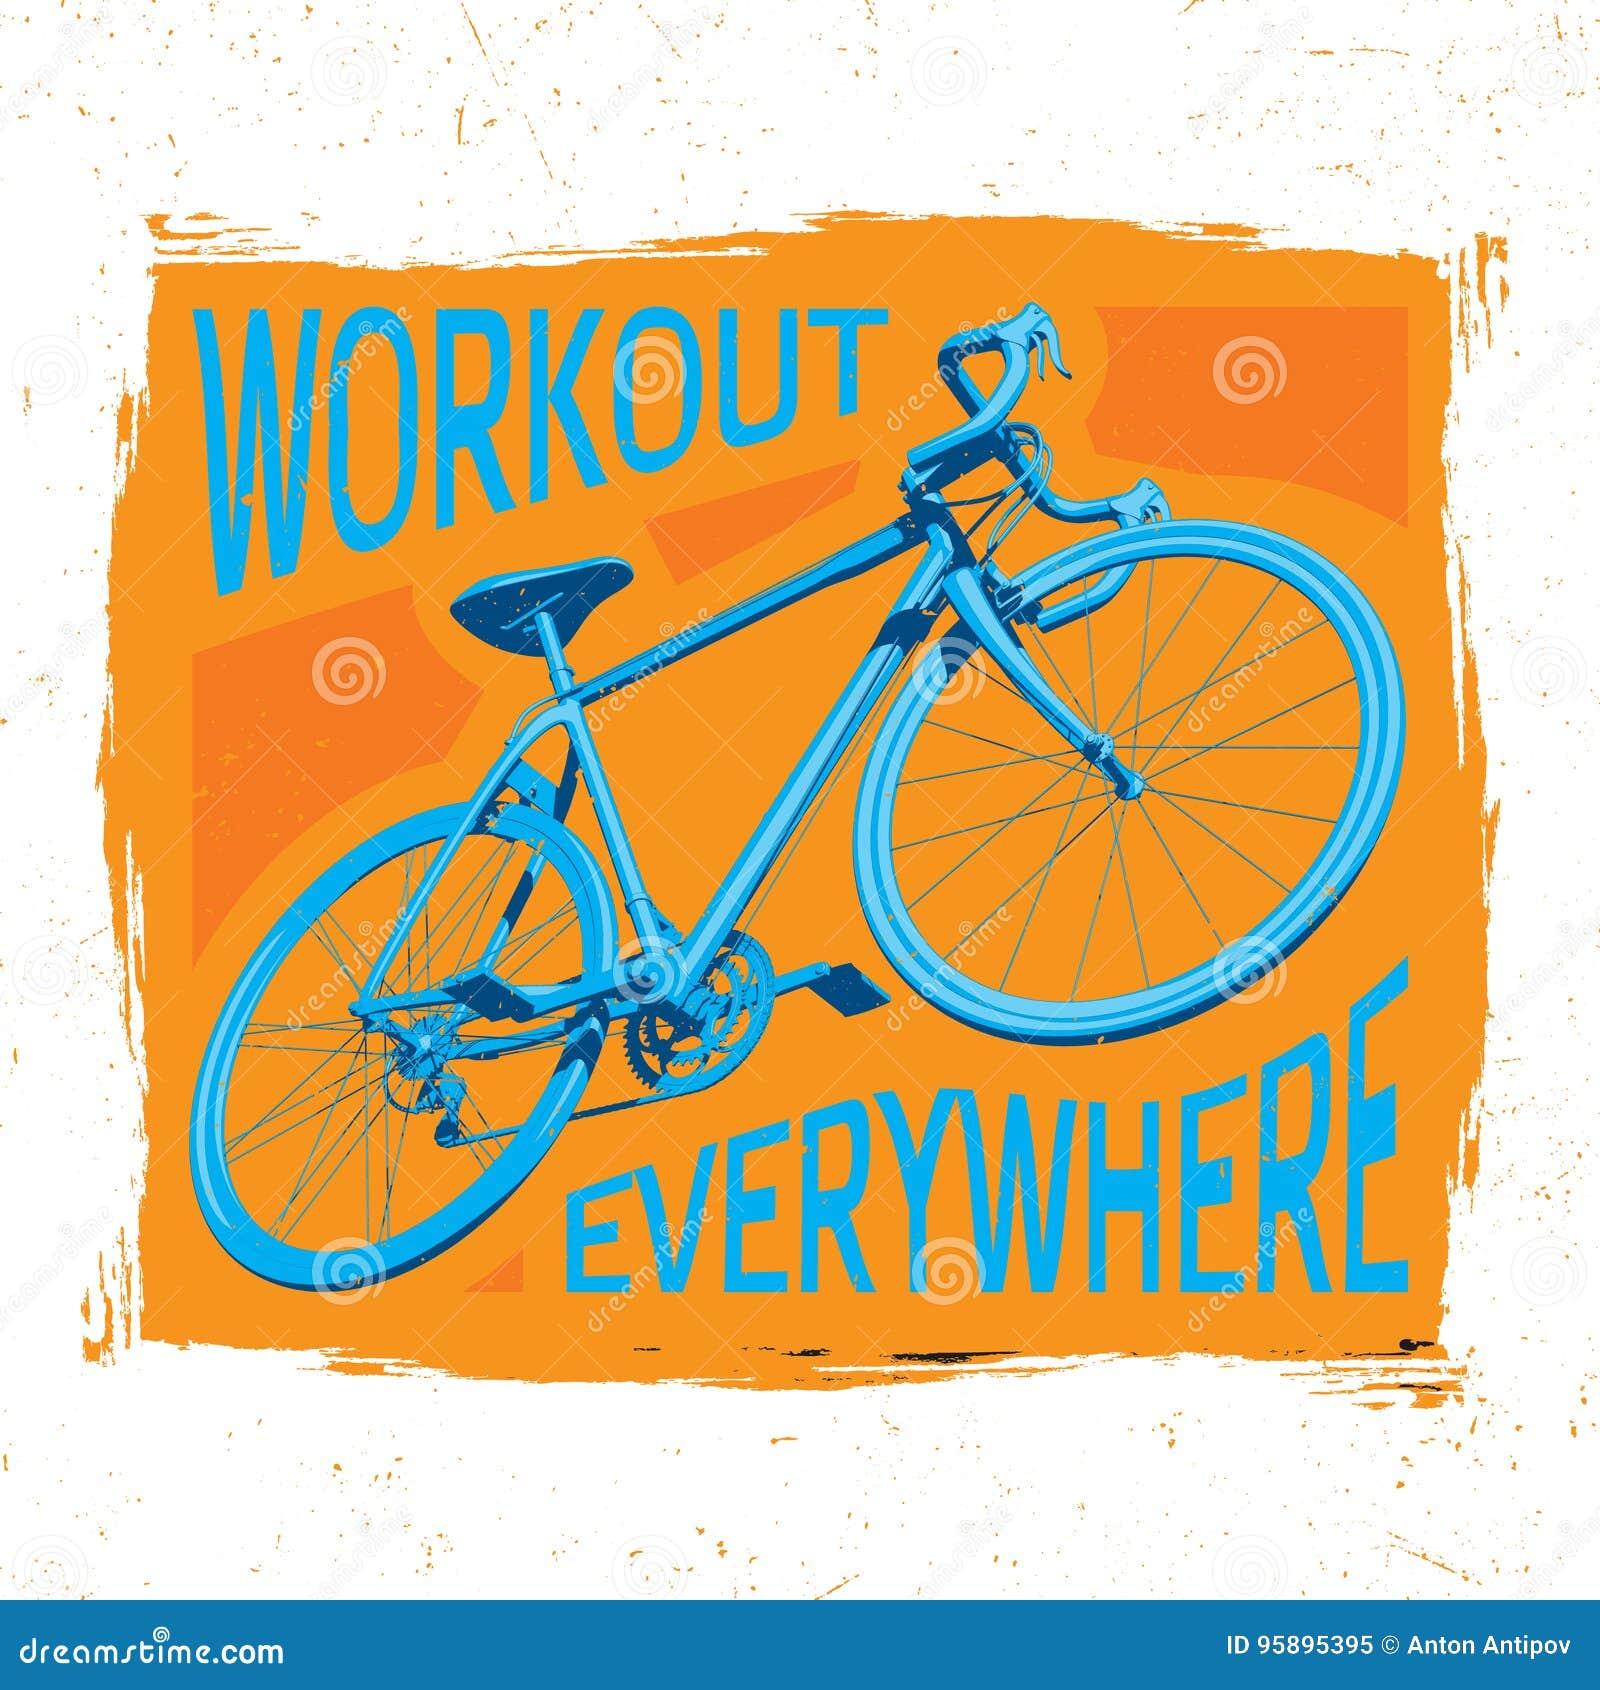 2e3121c46b9 Αφίσα Workout ποδηλάτων διανυσματική απεικόνιση. εικονογραφία από ...